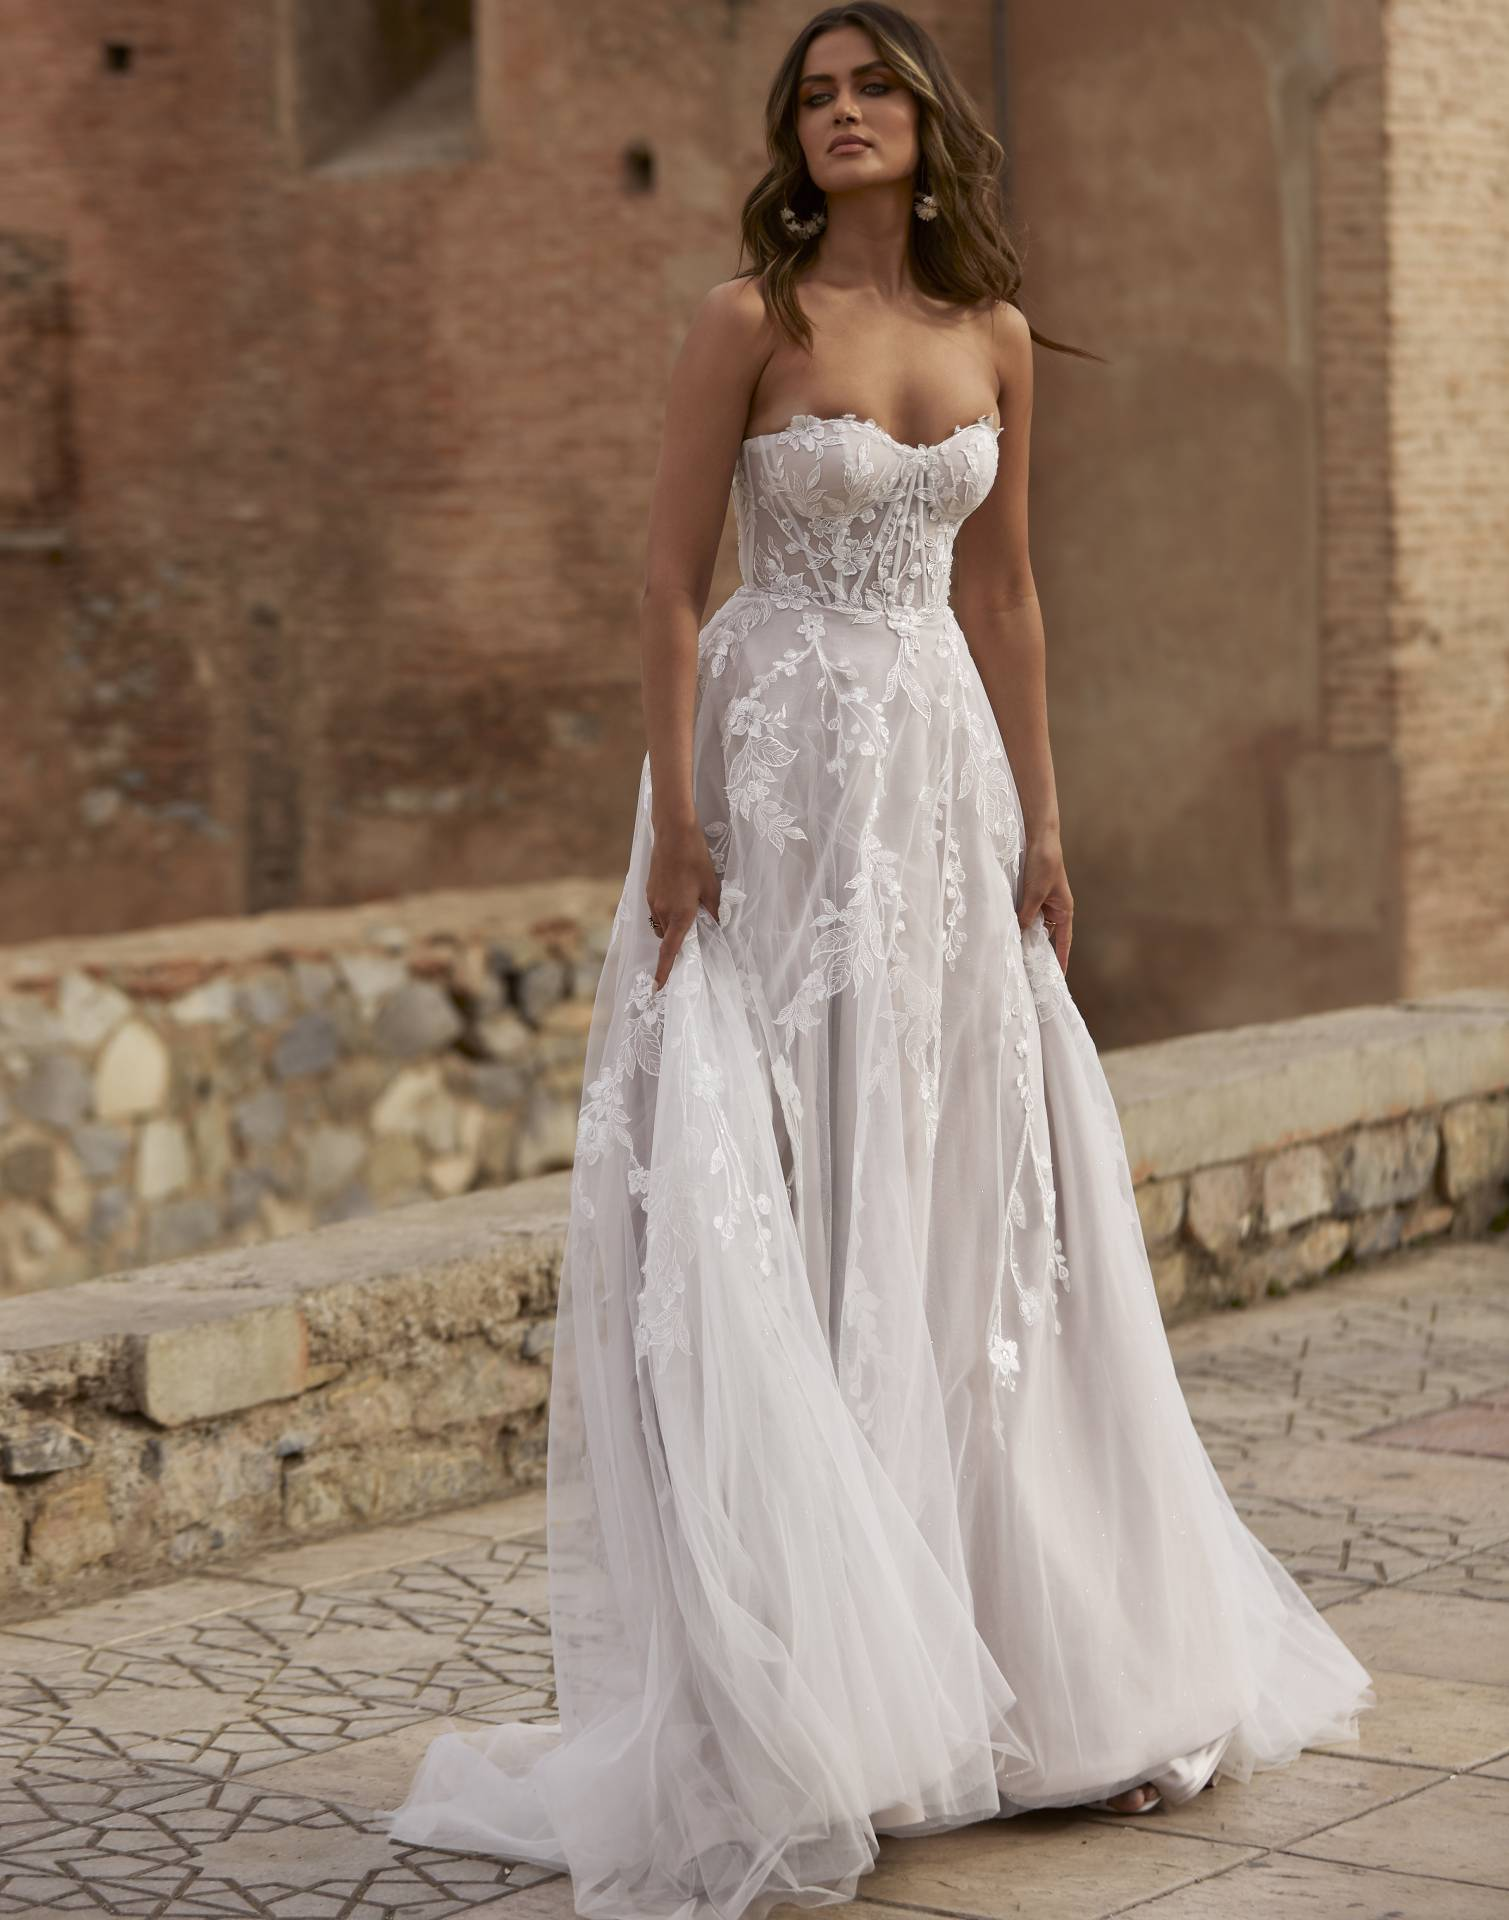 ADALYN – Madi Lane Wedding Dress Collection – Front View